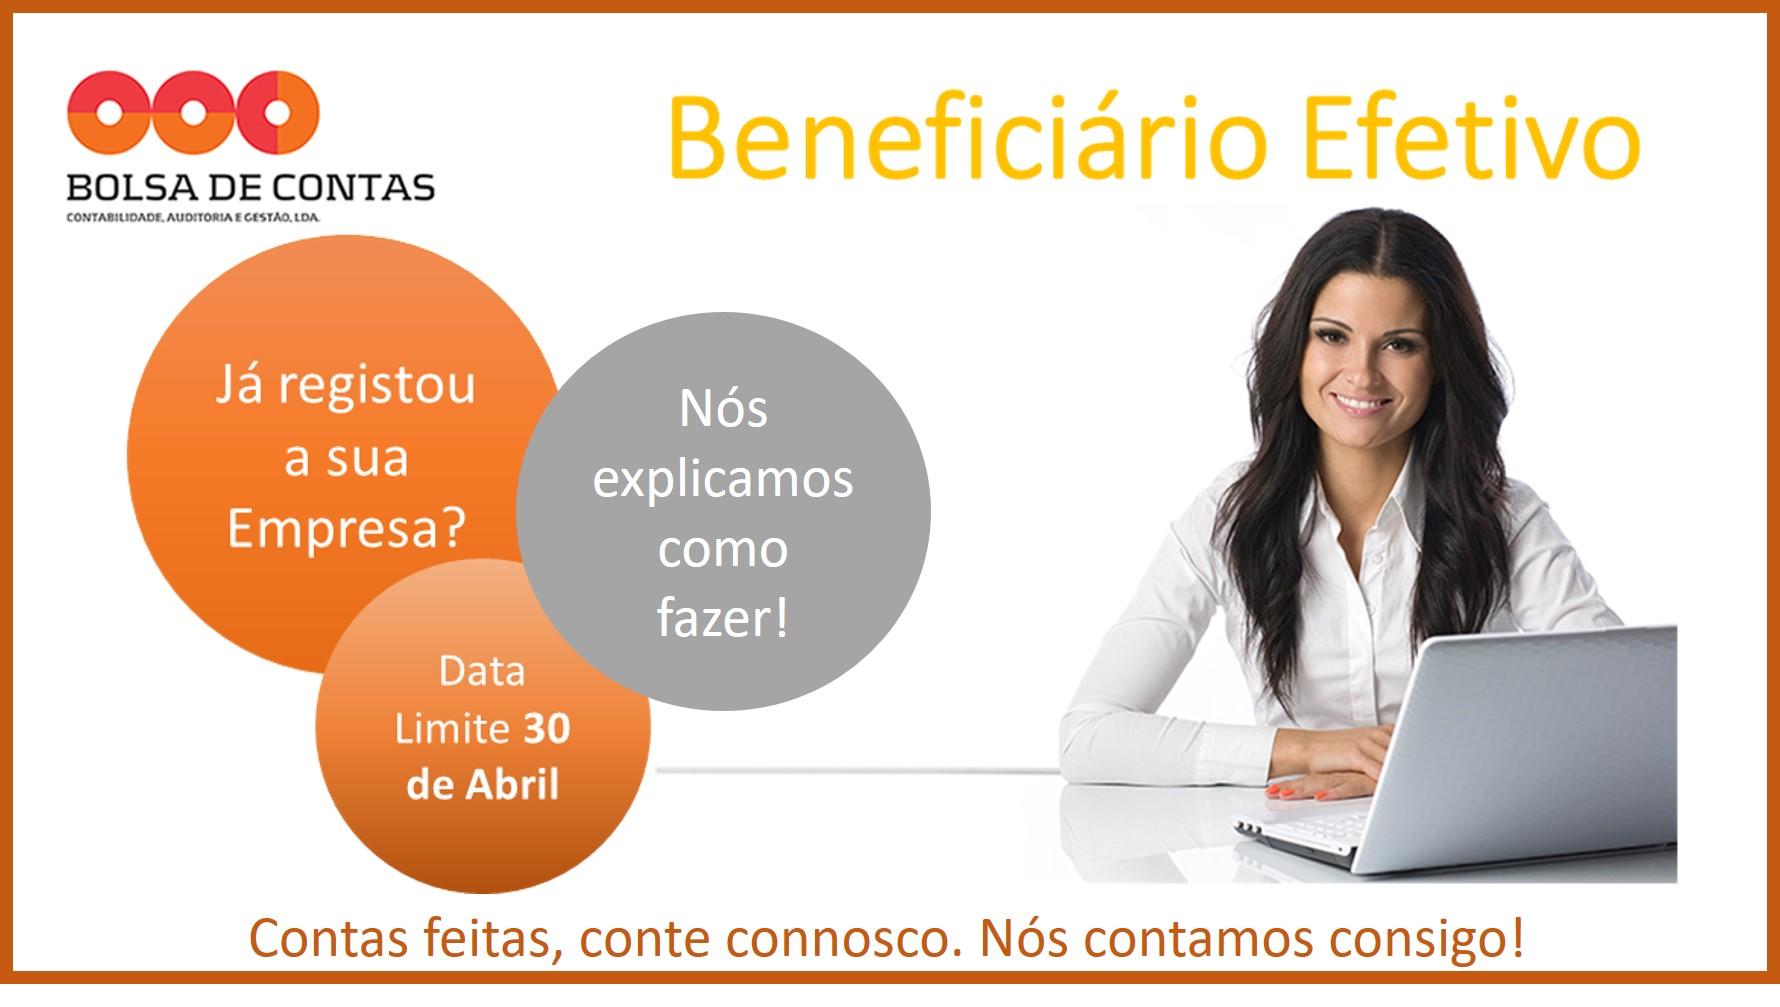 Imagem Beneficiario Efetivo_Site